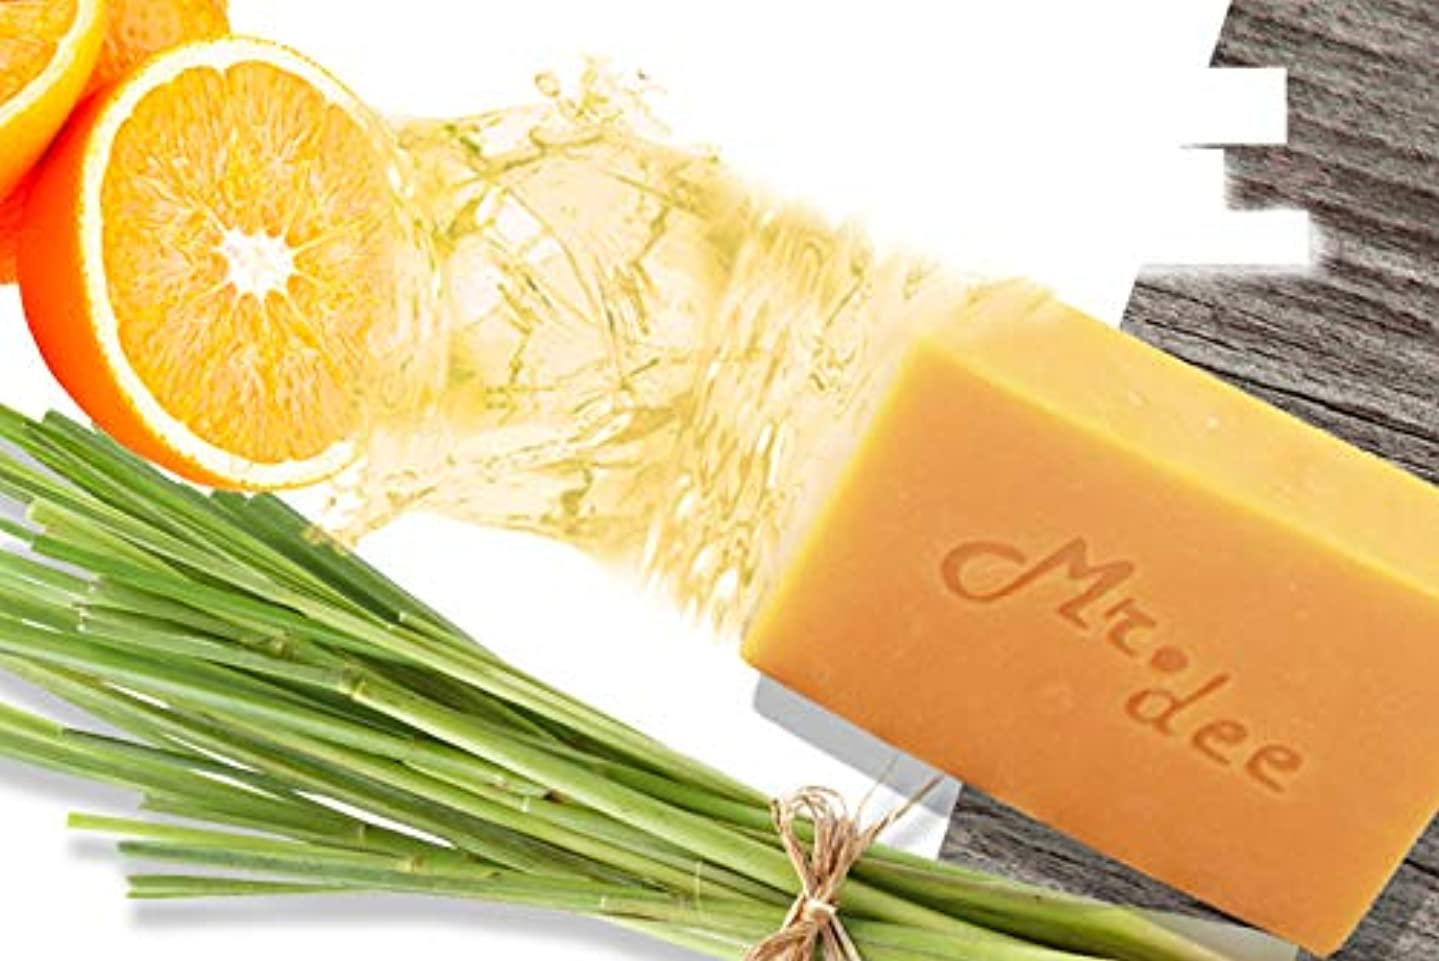 「Mr.Dee」100%天然石鹸バーレモングラスエッセンシャルオイルパックを白くする非化学シアバター5バー(100グラム/バー)